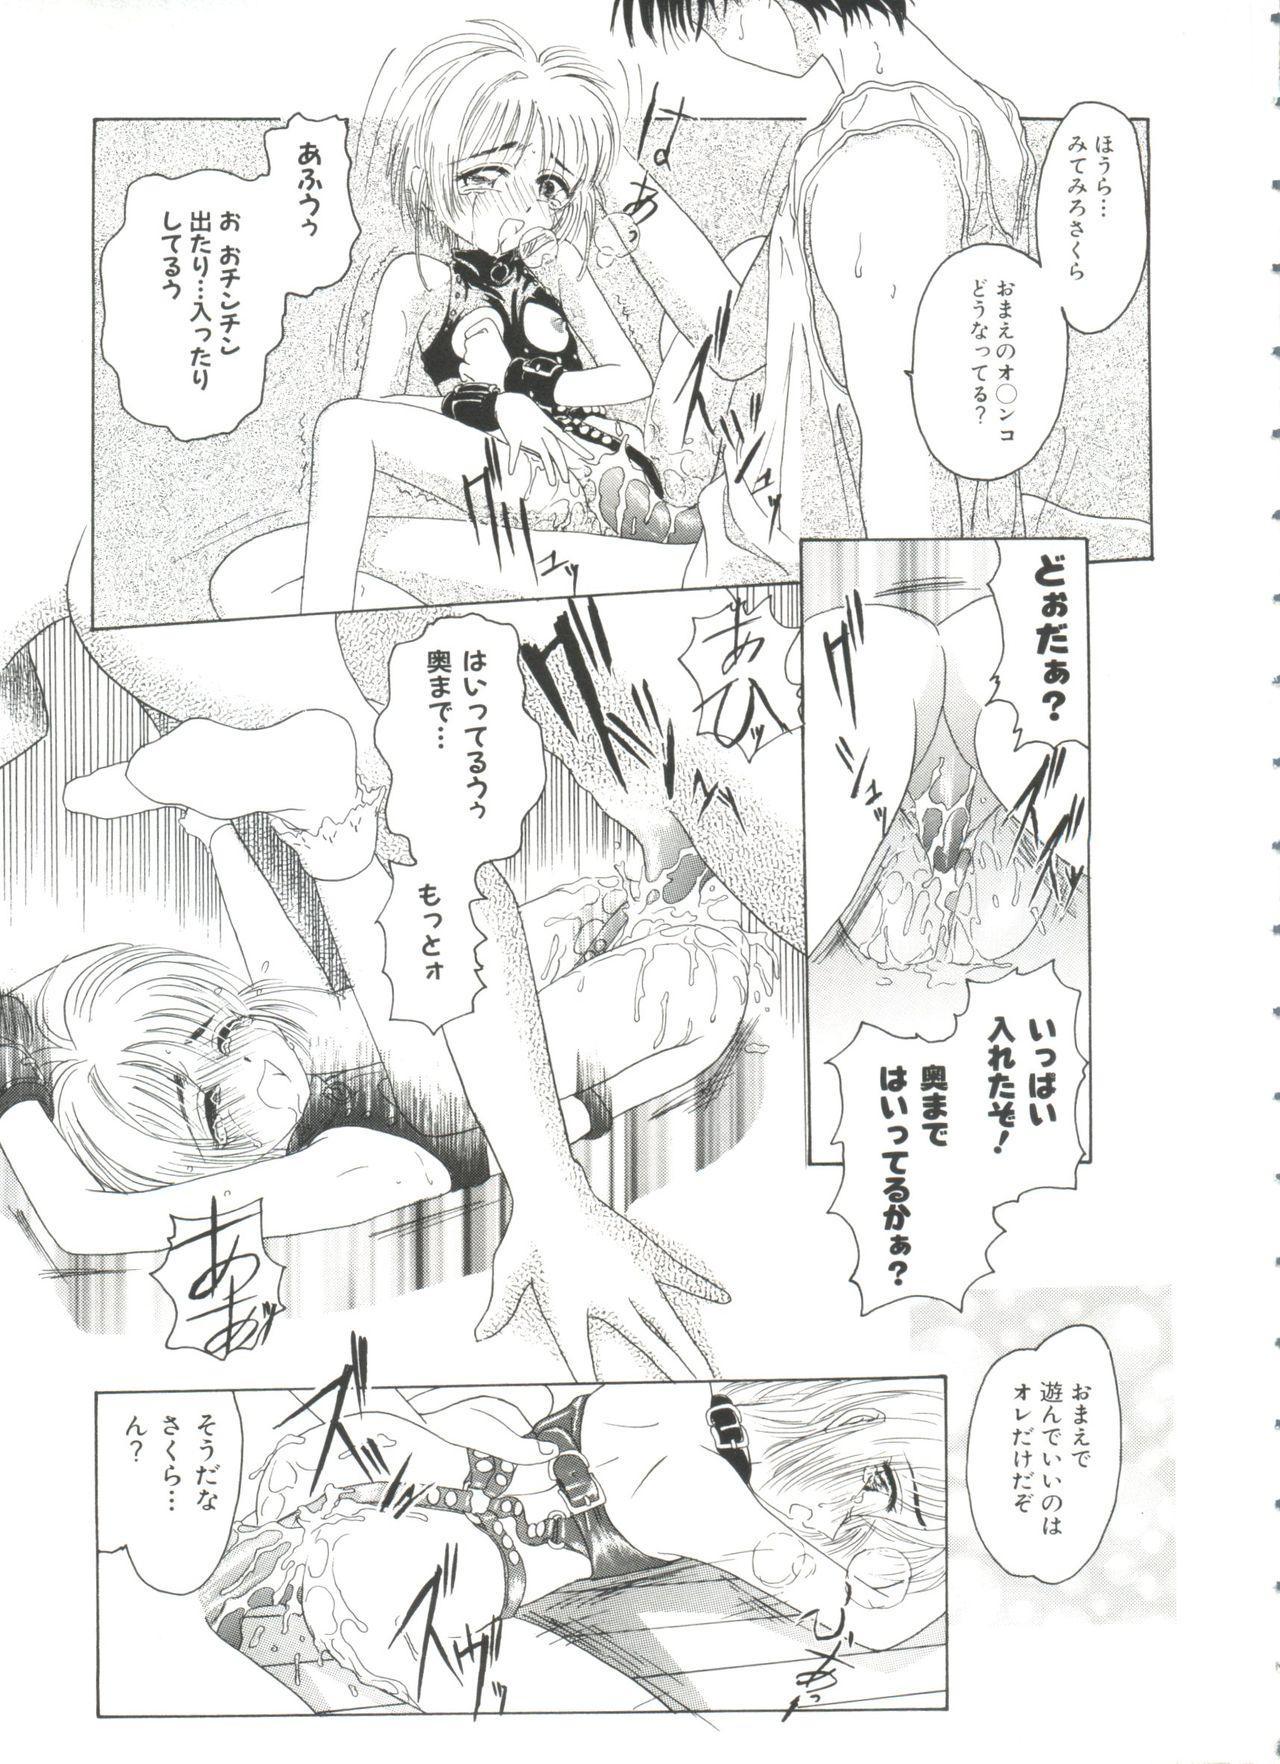 Ero-chan to Issho 80